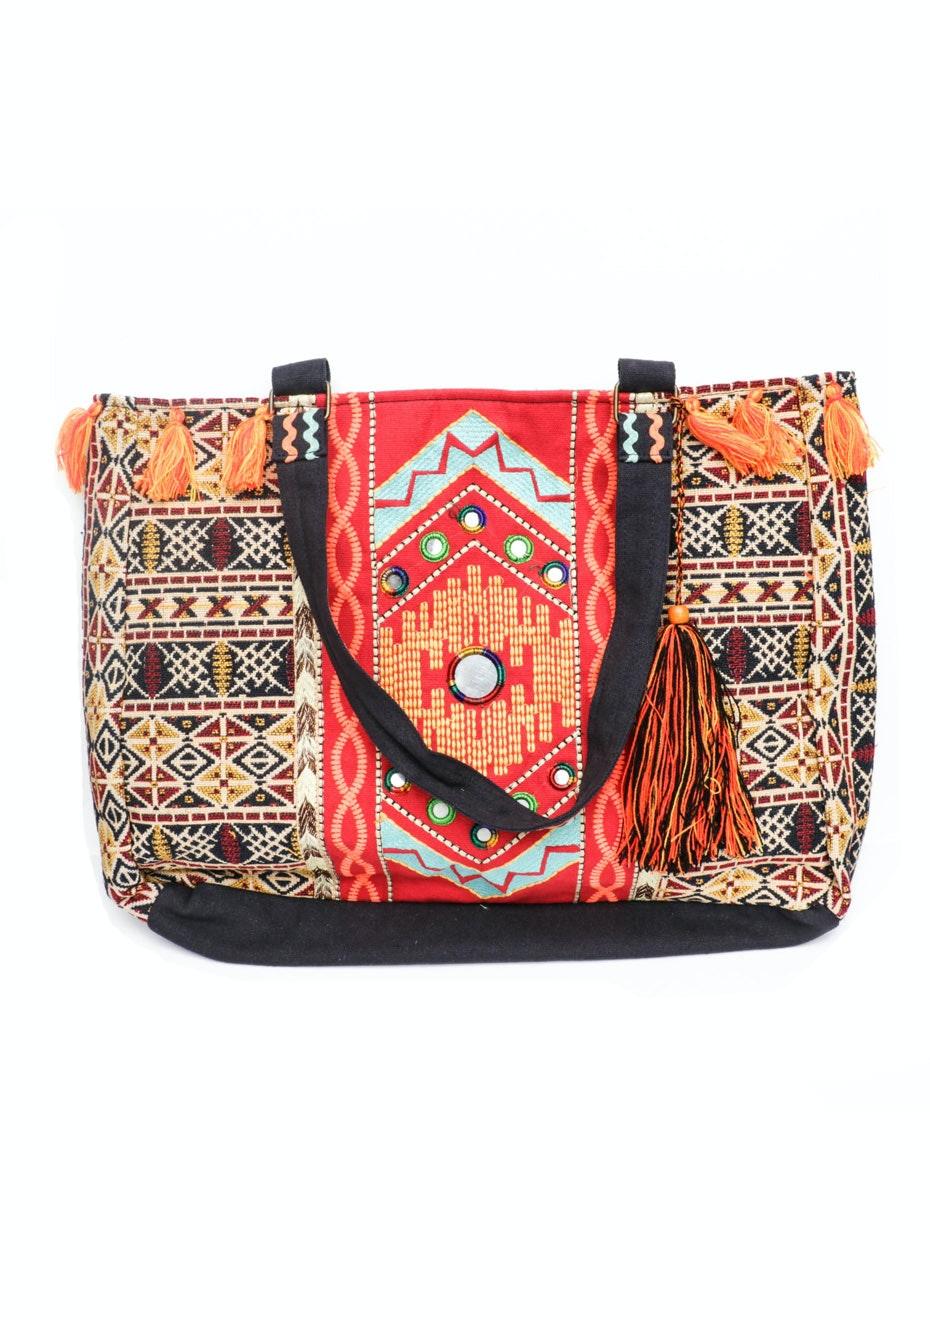 Handbag - Orange Design With Orange Tassles